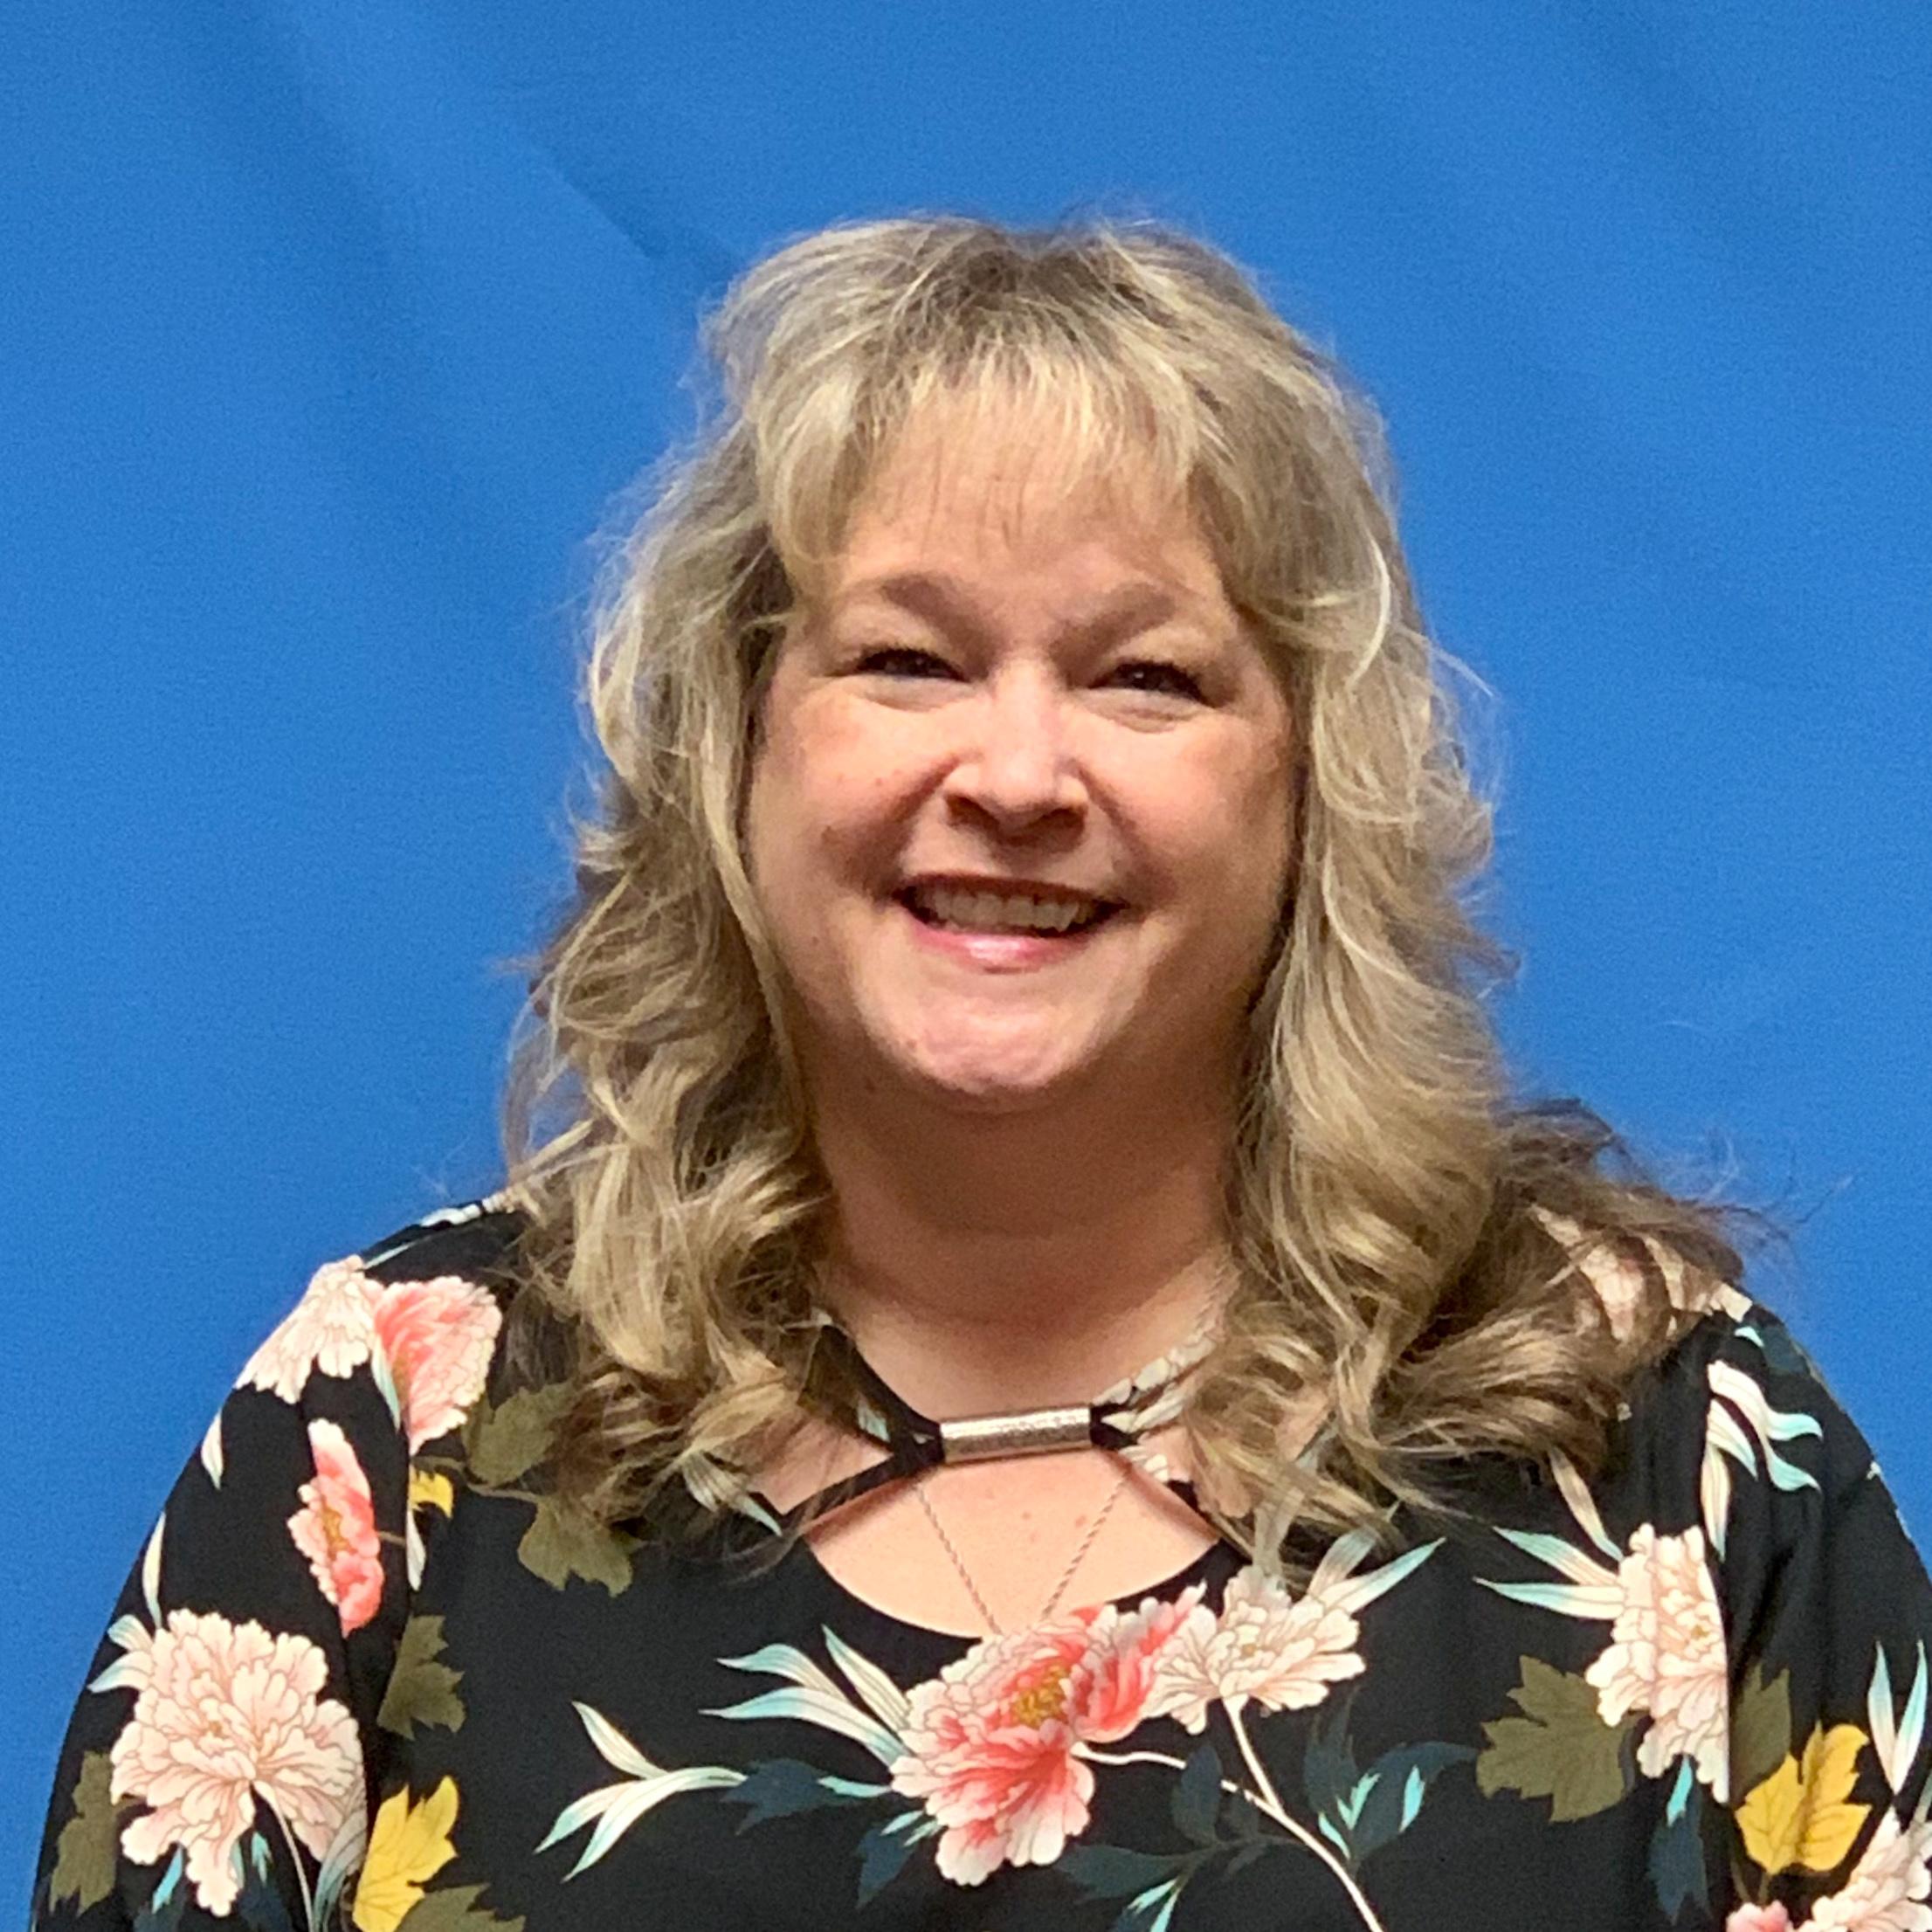 Staff Photo of Toni Parrish